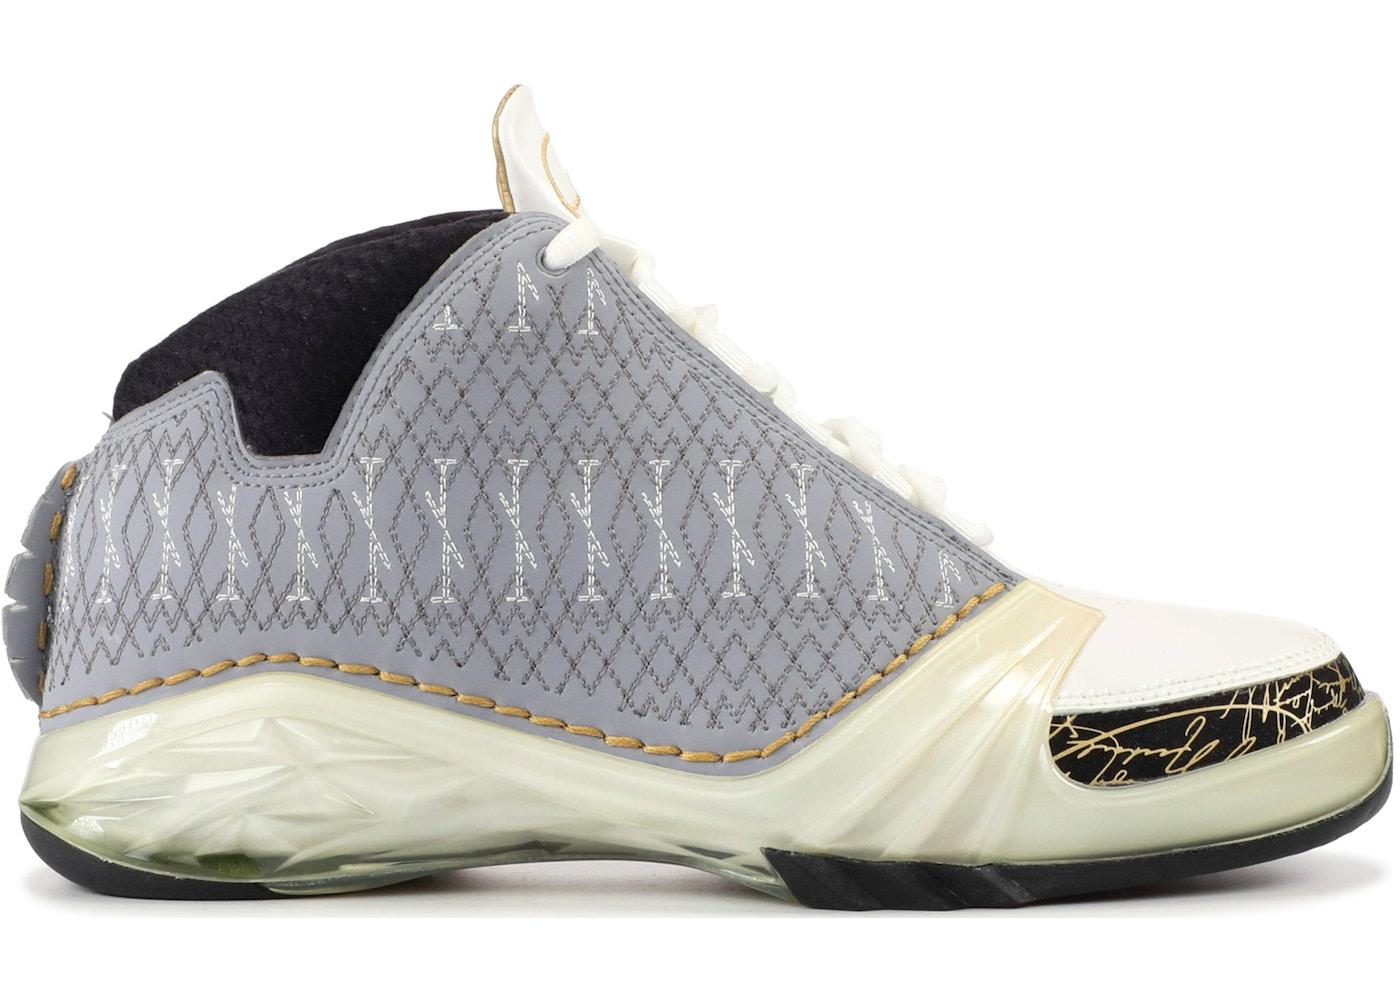 Jordan 23 White Stealth (GS)